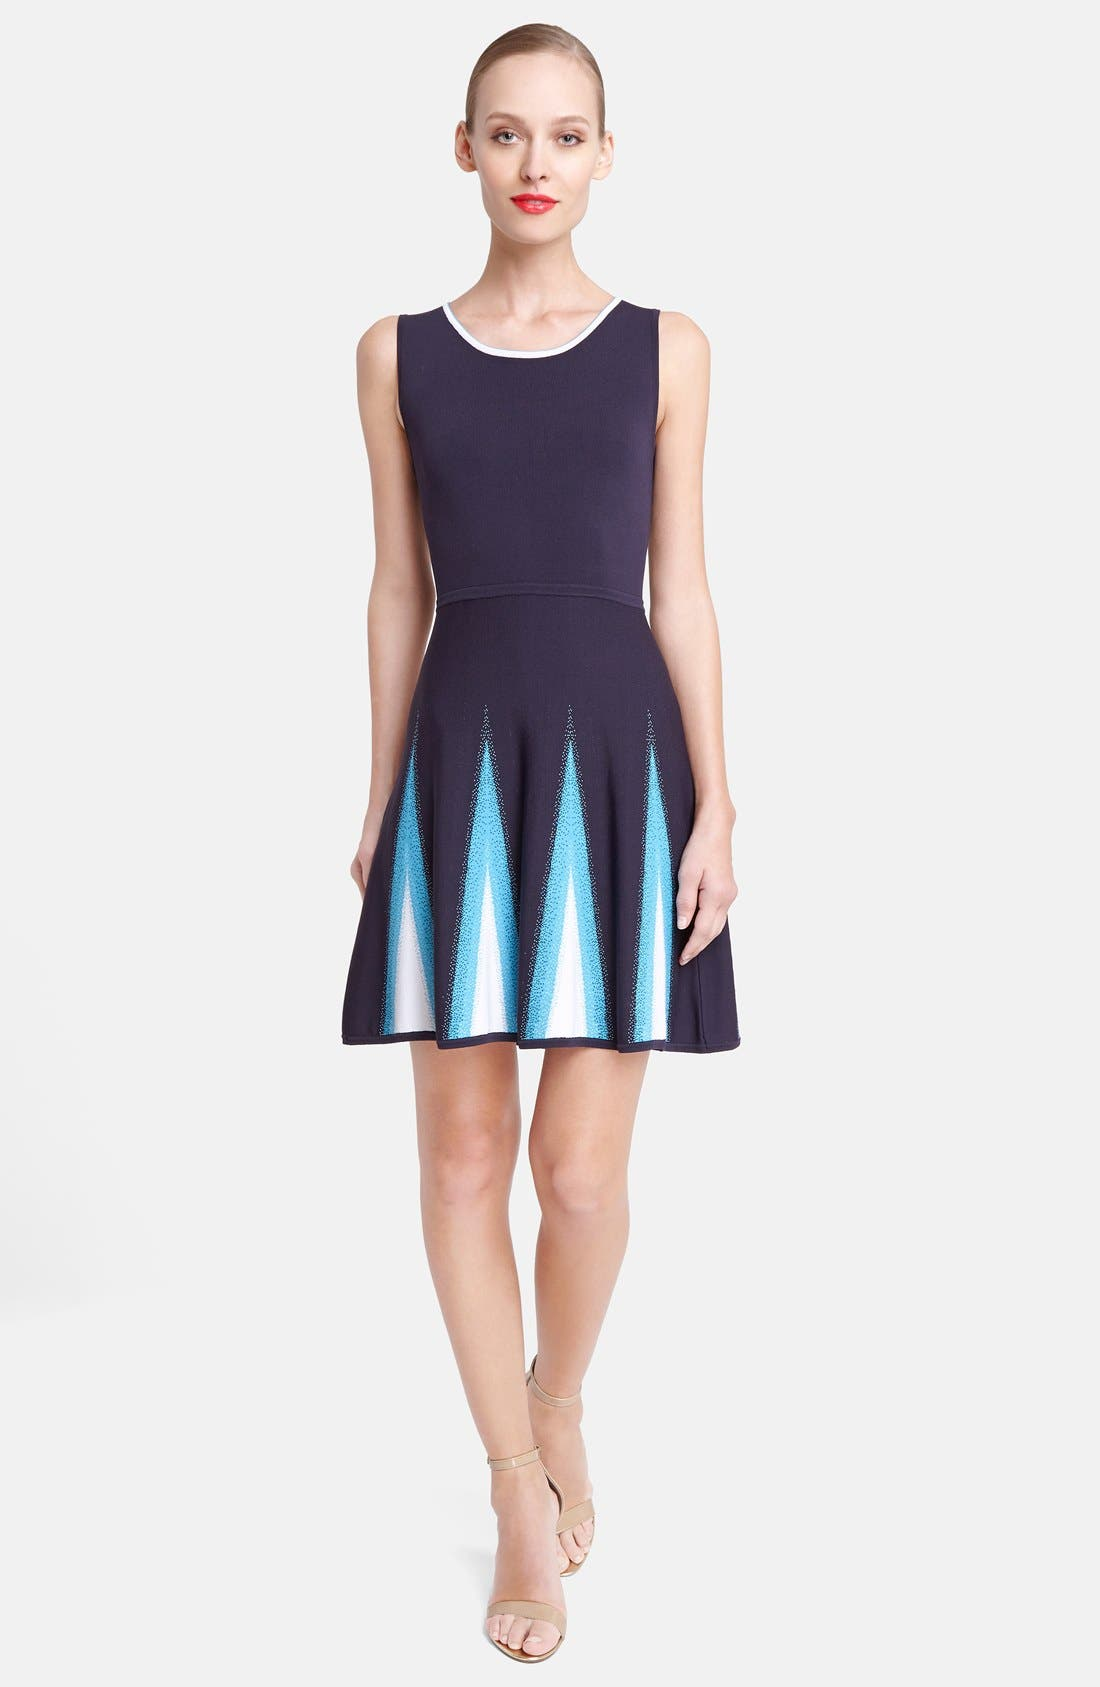 Alternate Image 1 Selected - Catherine Catherine Malandrino 'Concha' Dress